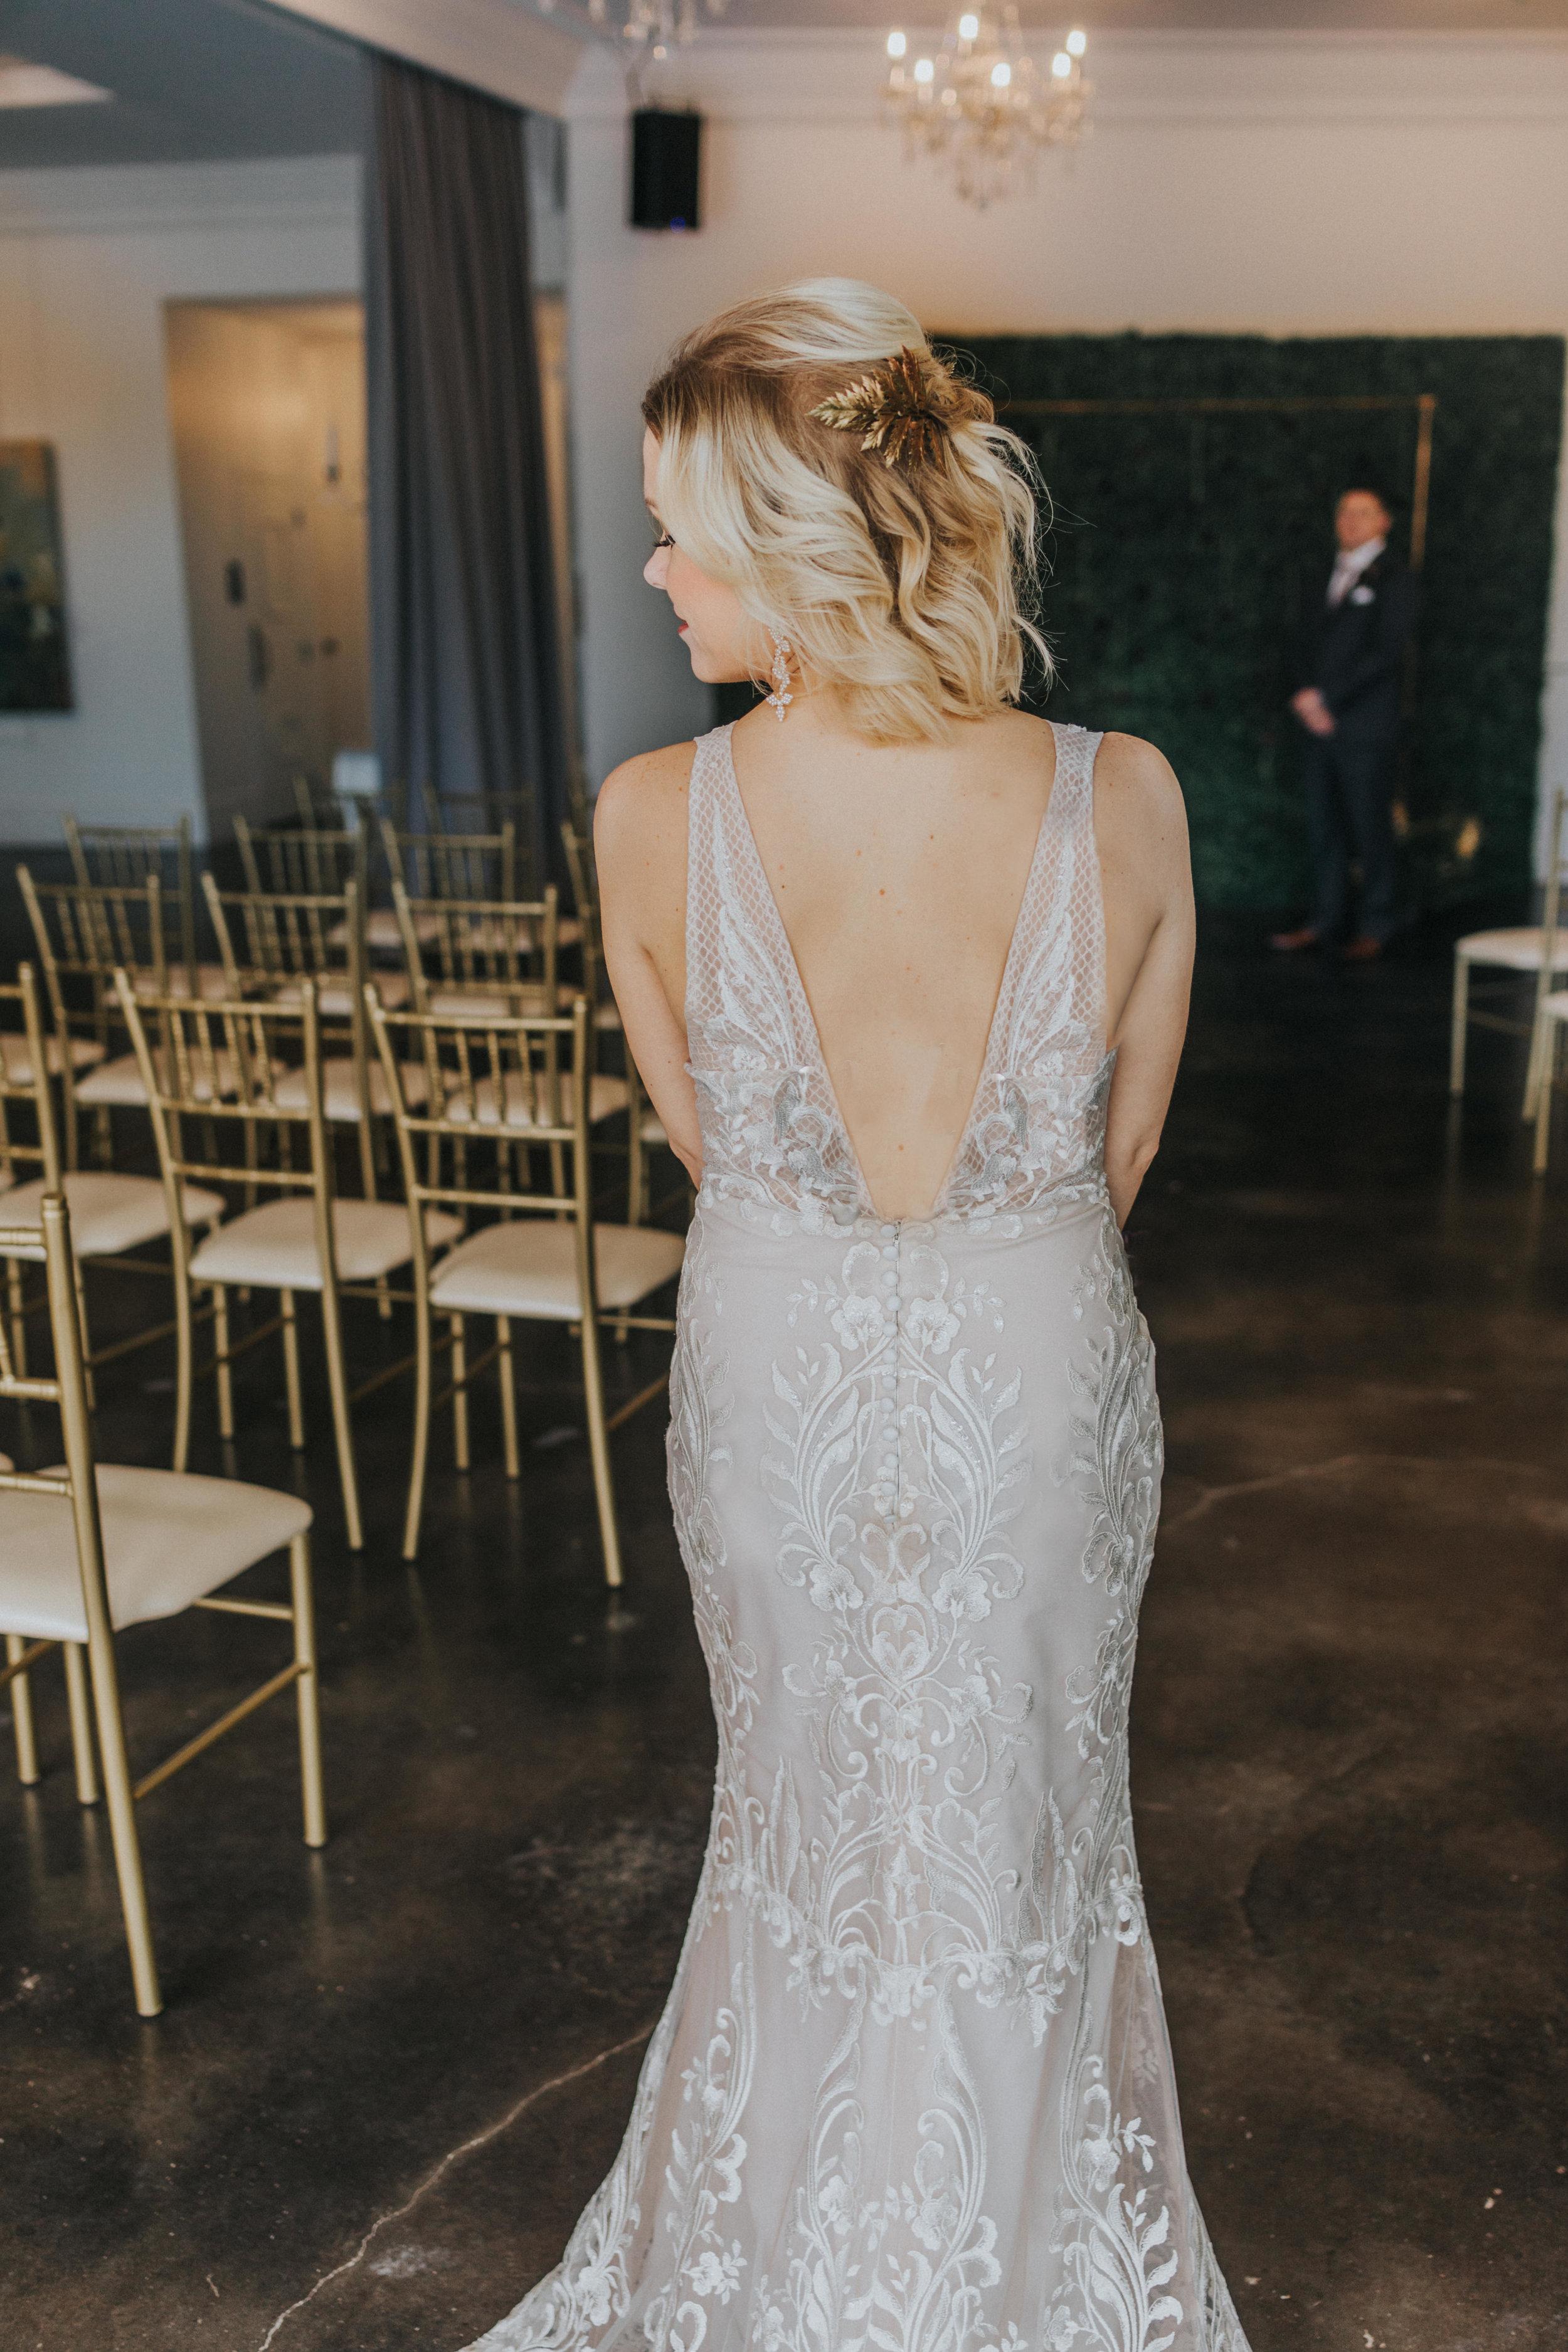 139 tiny-luxe-weddings-omaha-nebraska-midwest-empire-room.jpg